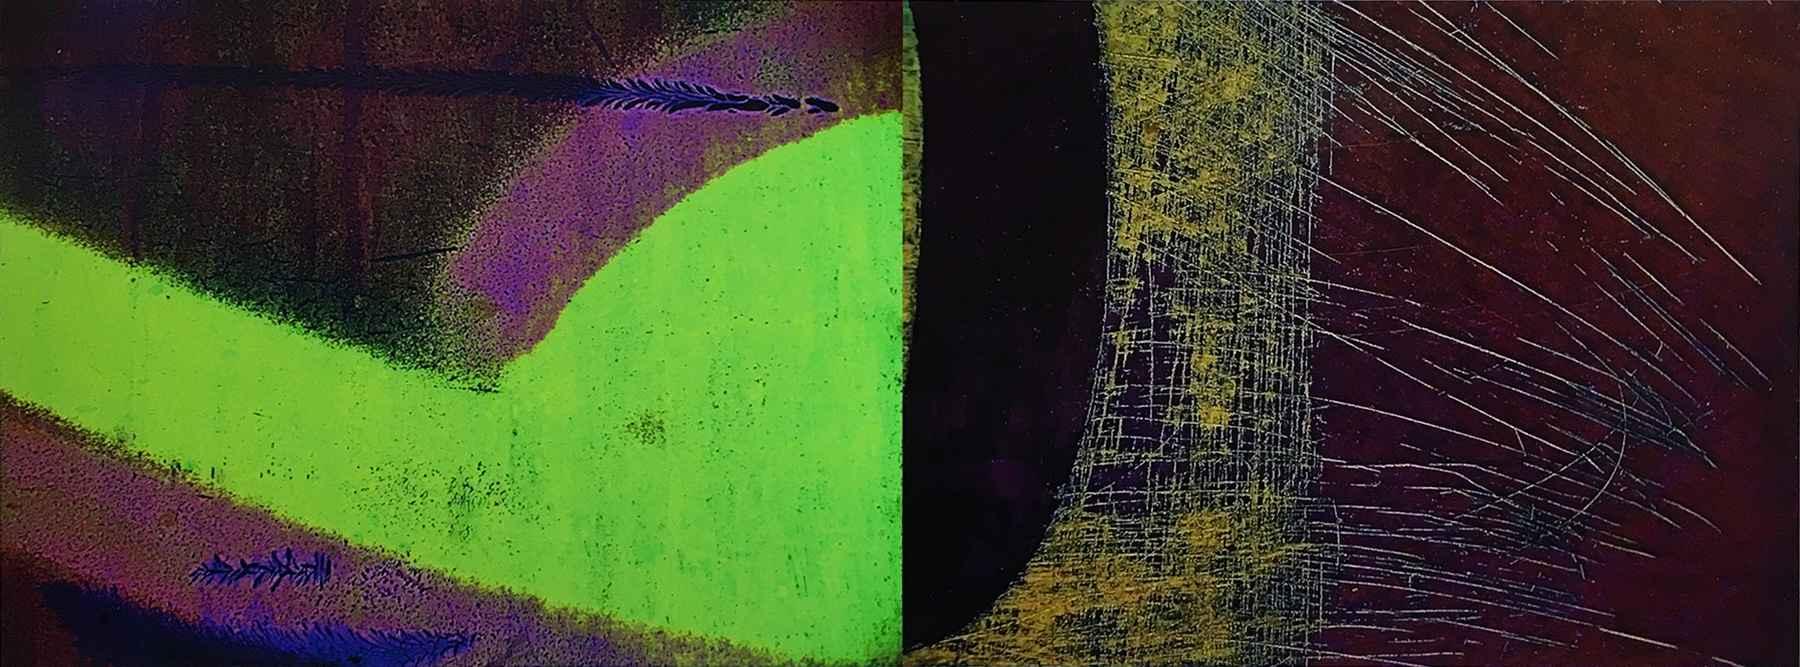 5062.9691 by  Andrea Fuhrman - Masterpiece Online